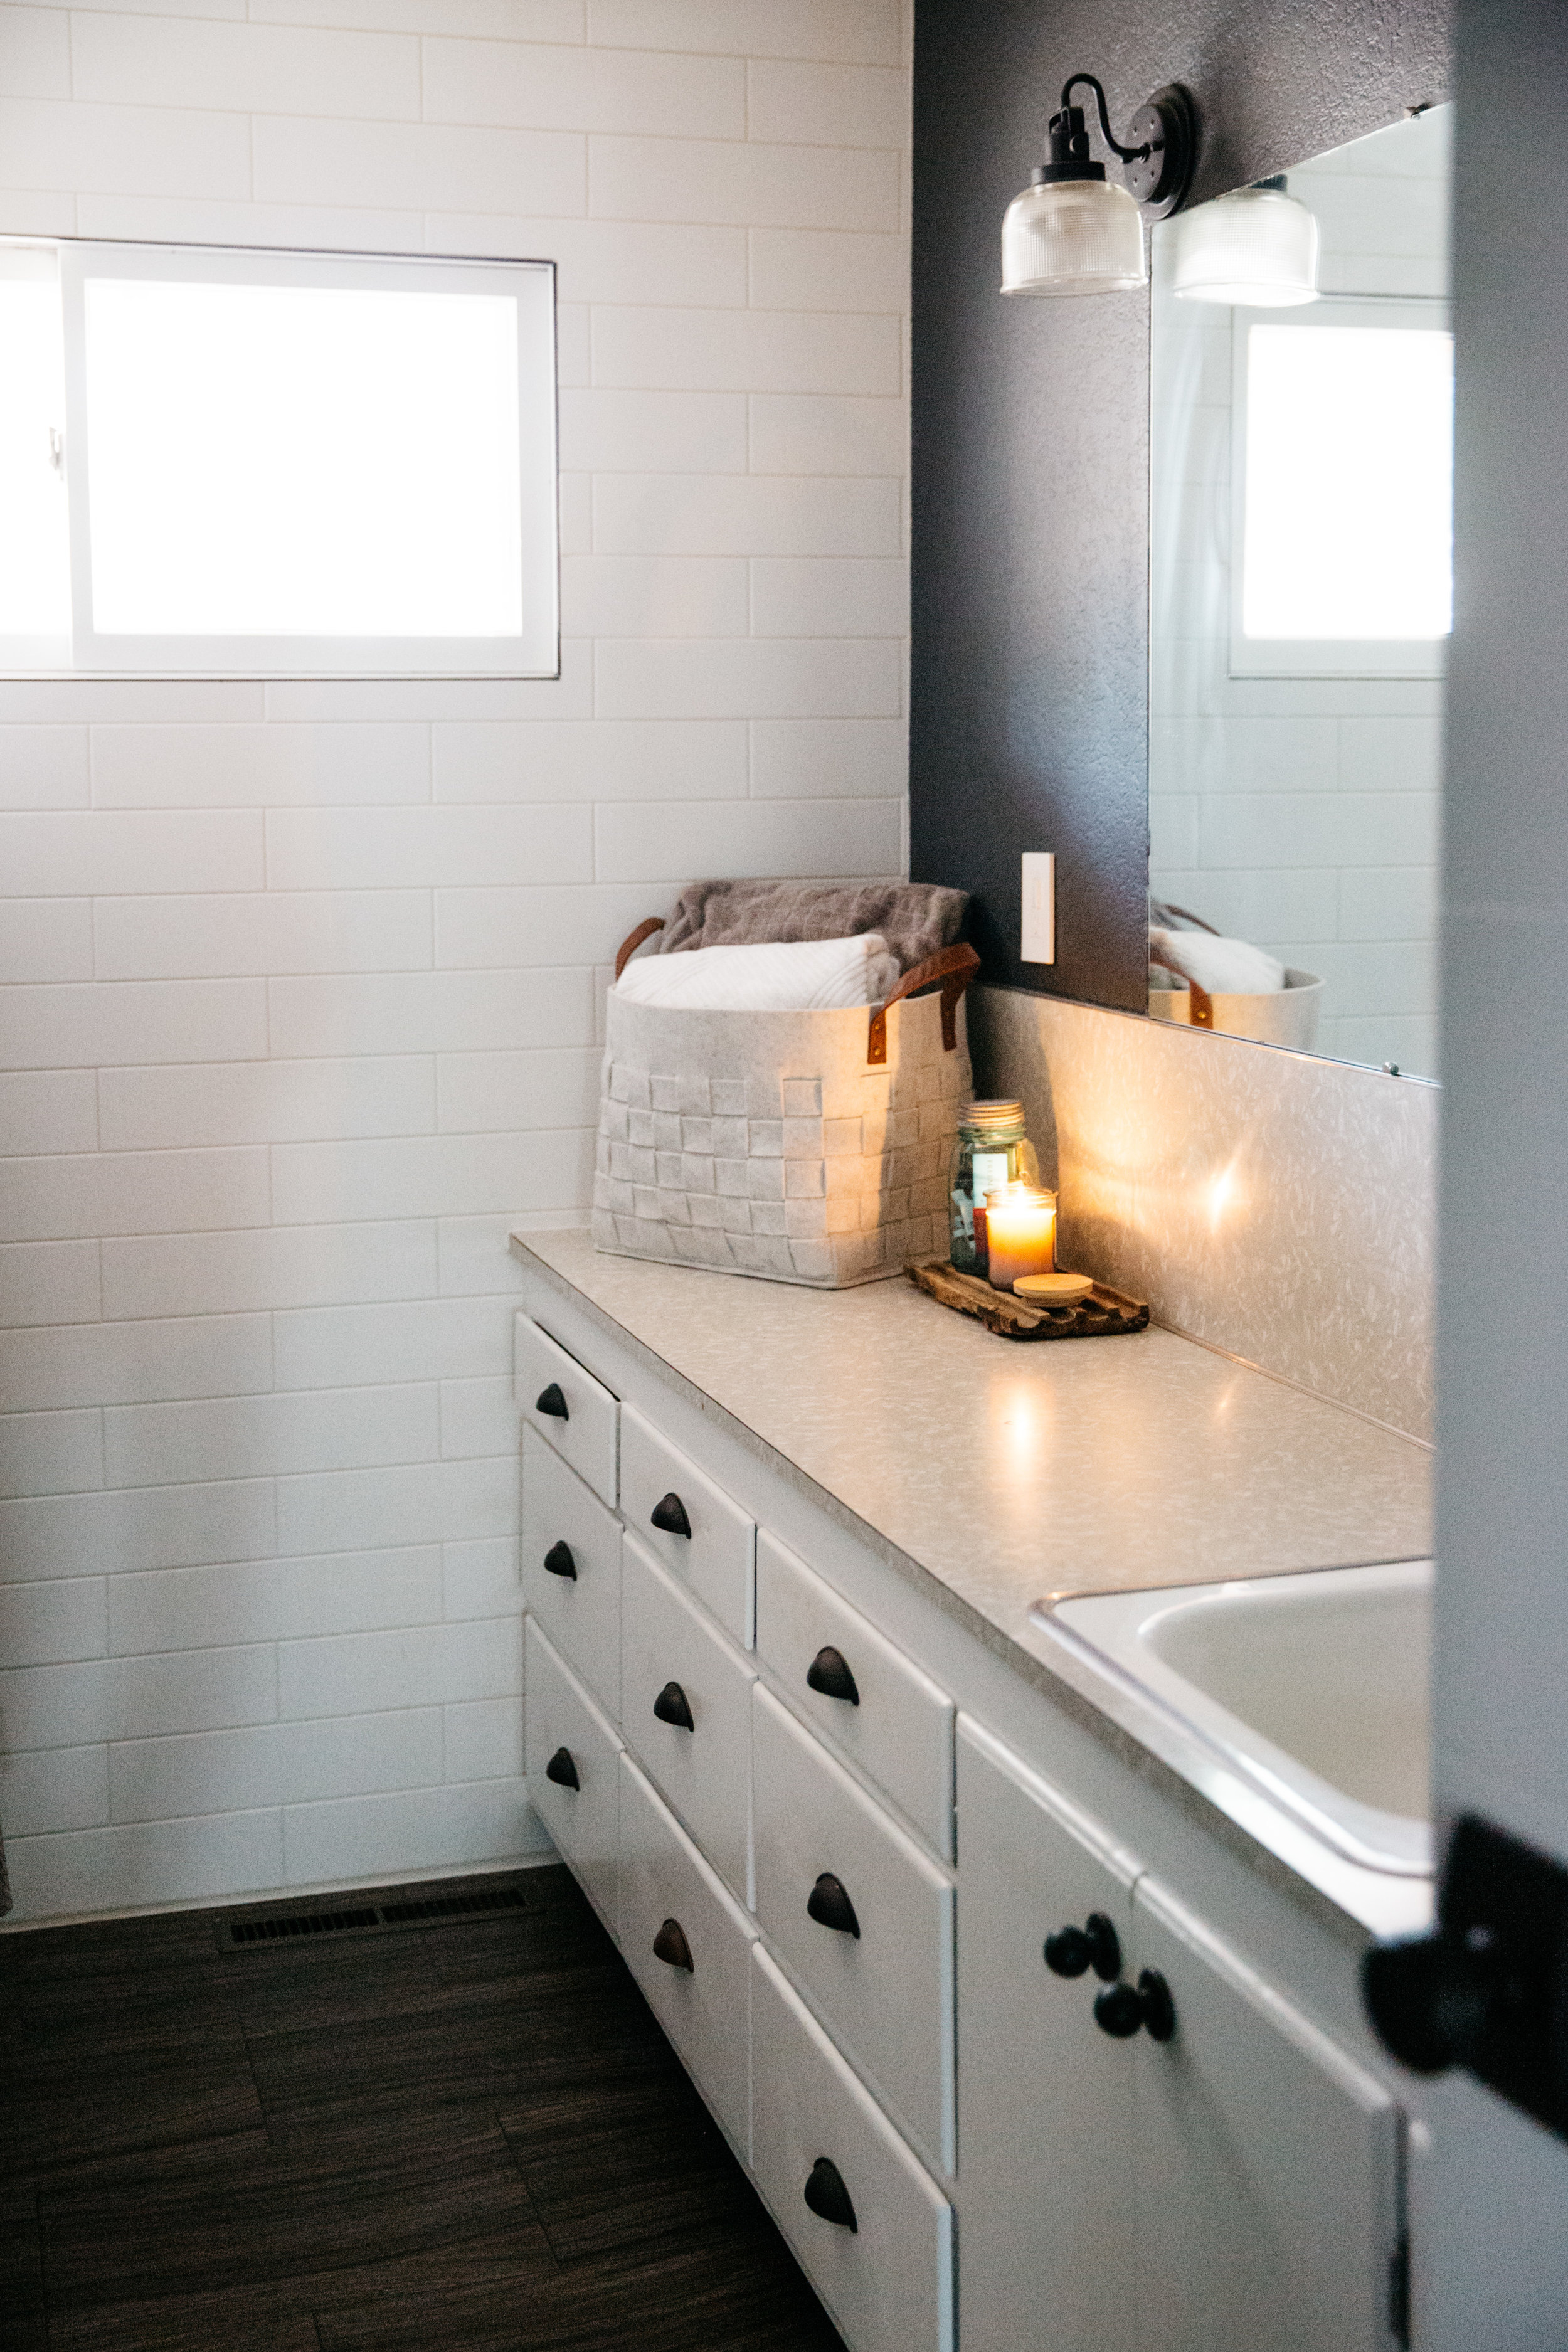 mitchell-guest-bathroom-after-1.jpg